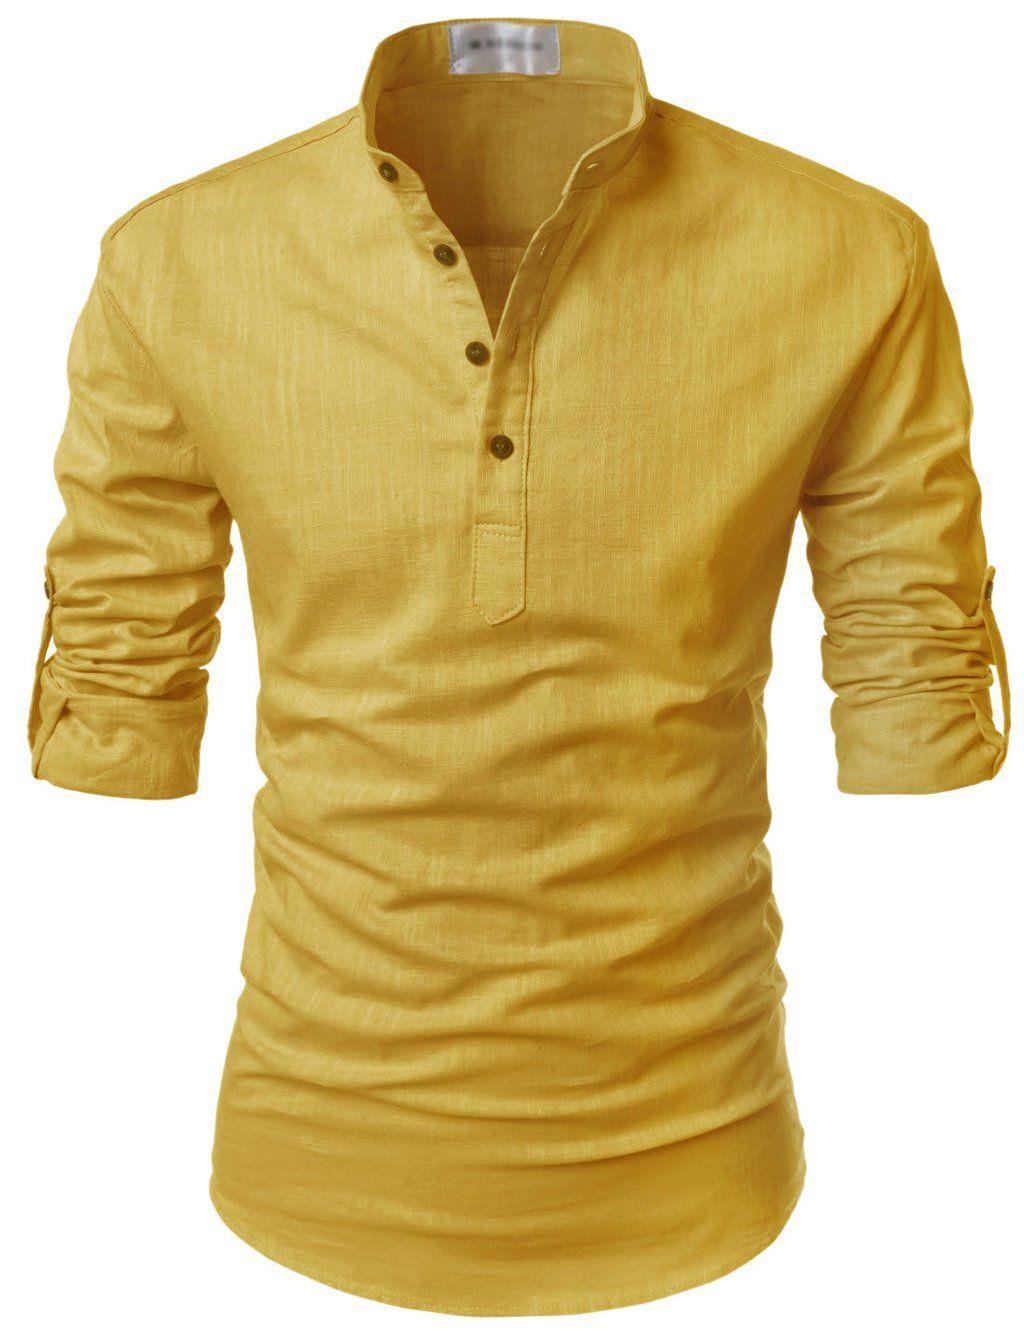 87dfe48dfd3 Bali Roll-up Linen Shirt in 2019 | Wedding attire | Men, Mens ...